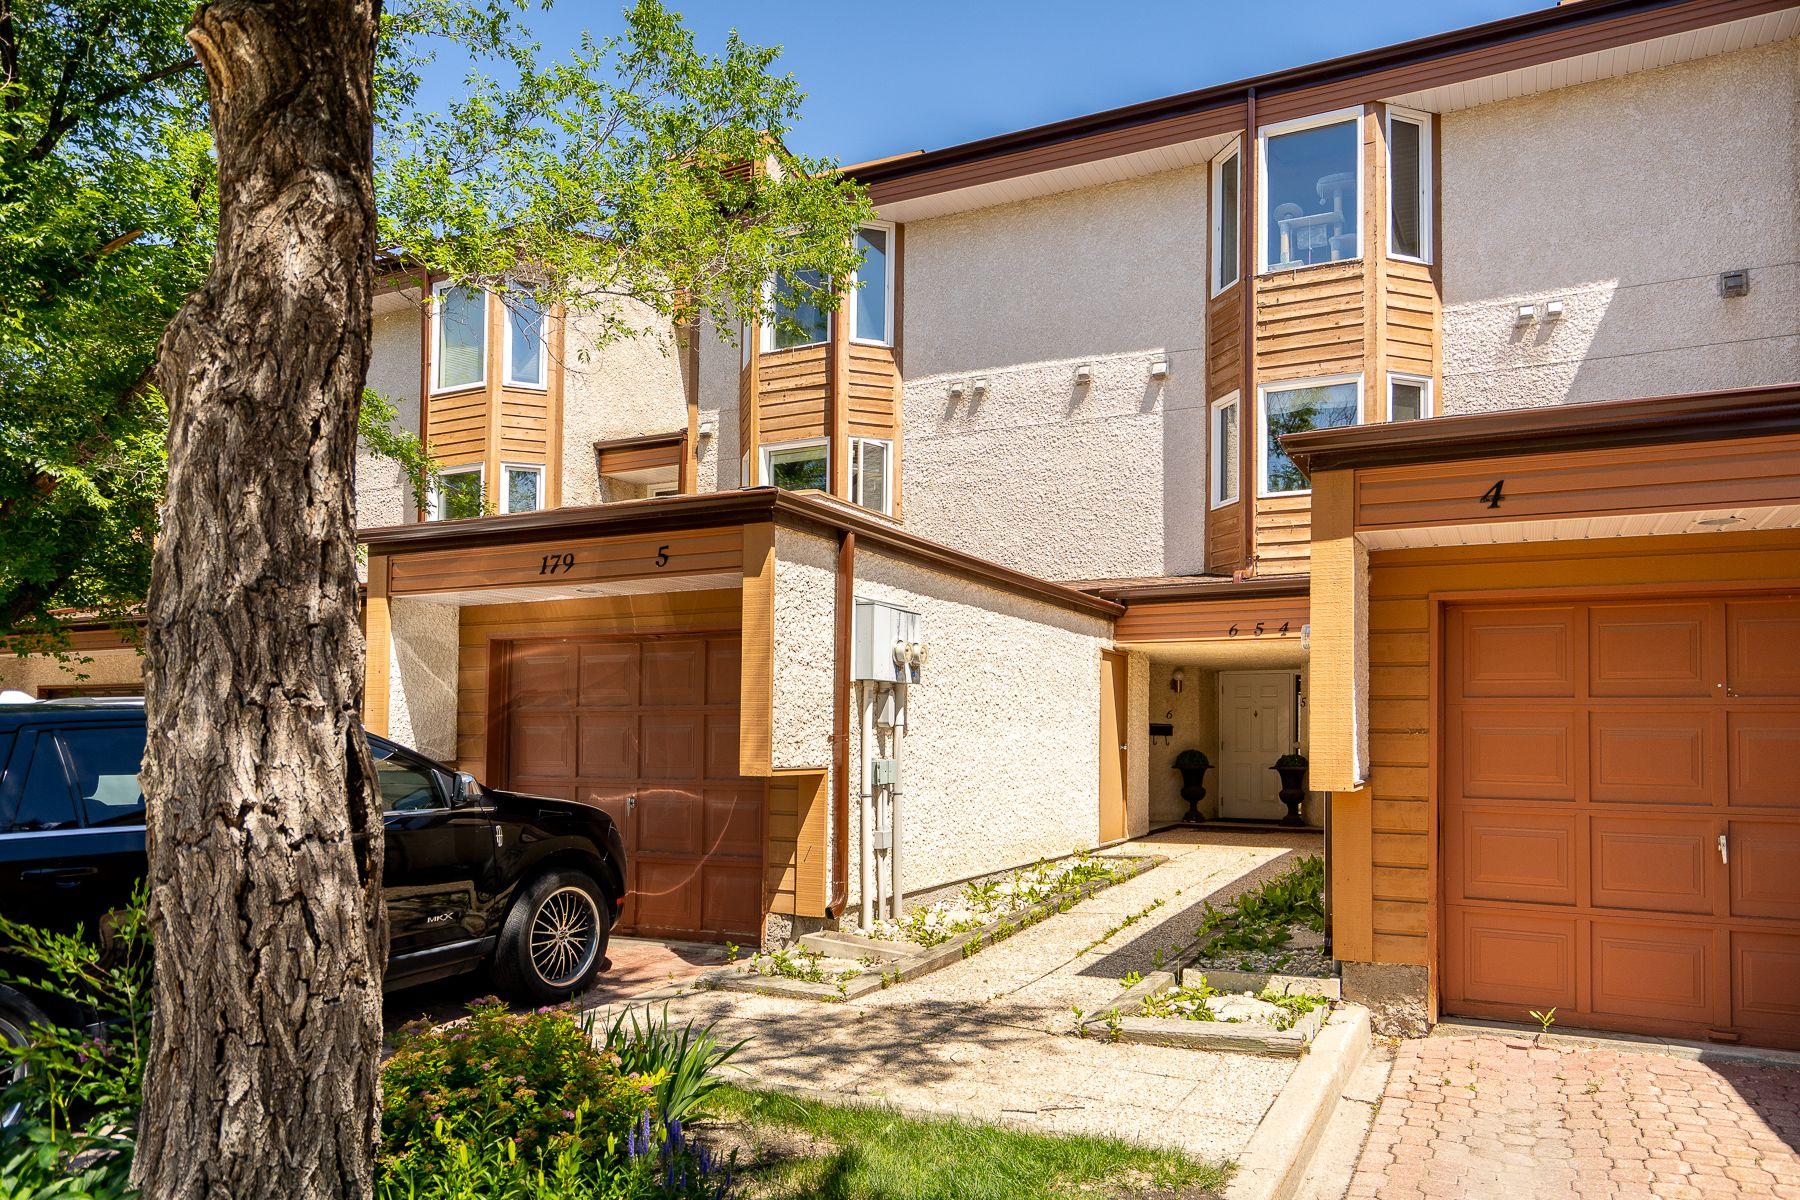 Main Photo: 6 179 Hamilton Avenue in Winnipeg: Crestview House for sale (5H)  : MLS®# 202015805